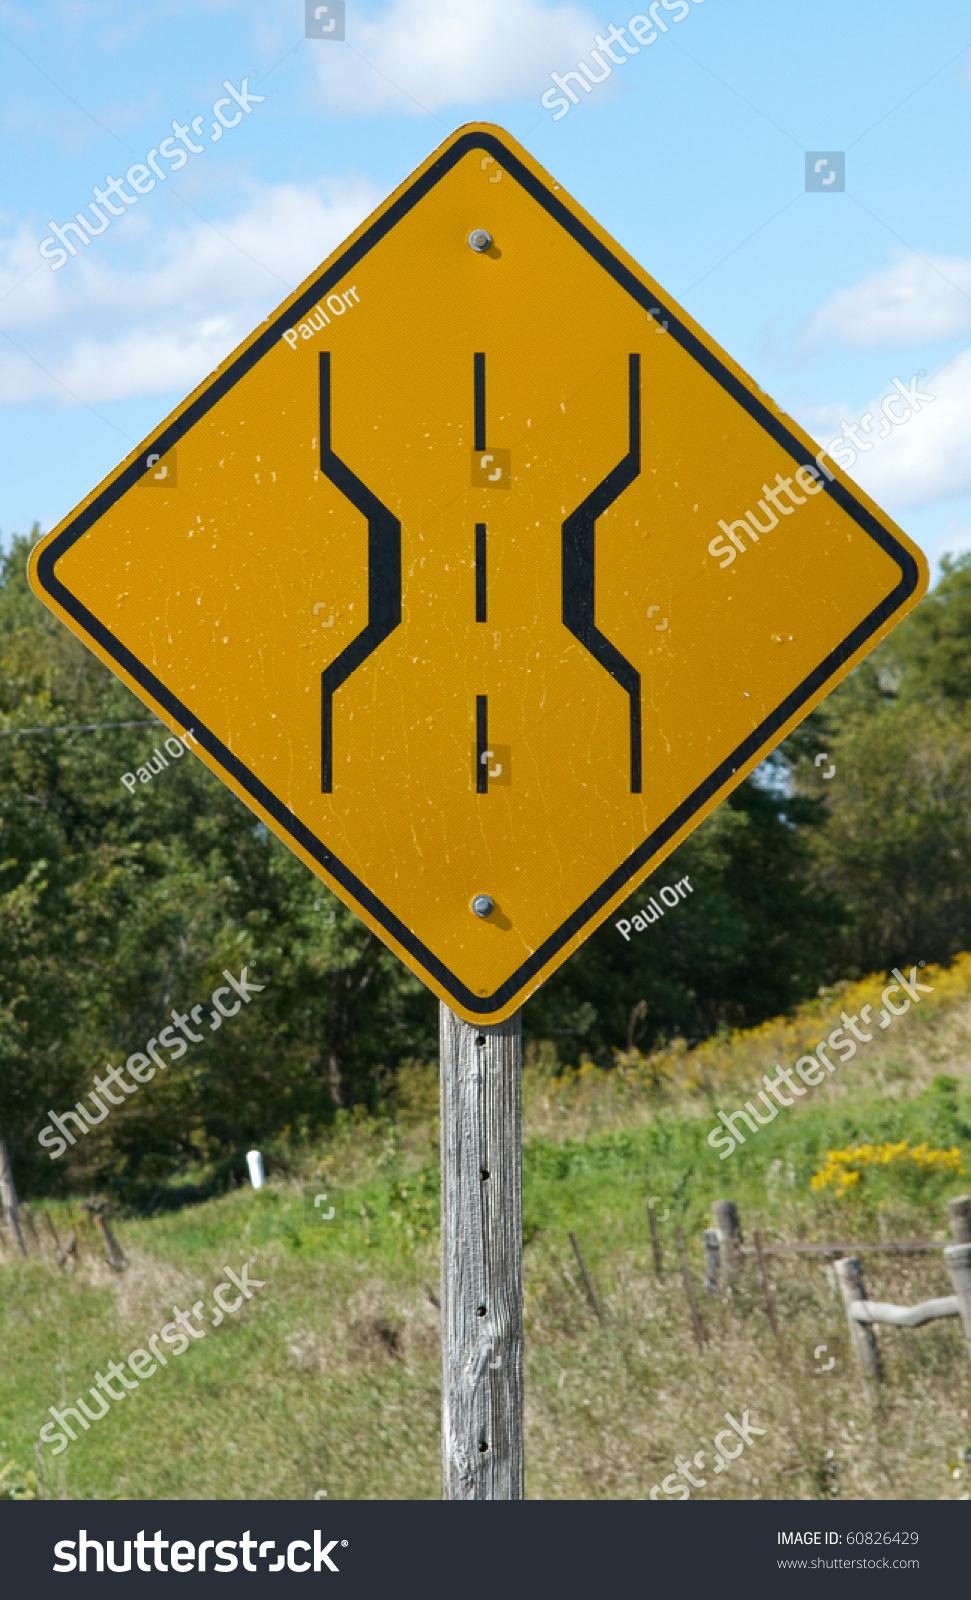 narrow bridge sign on country road stock photo 60826429